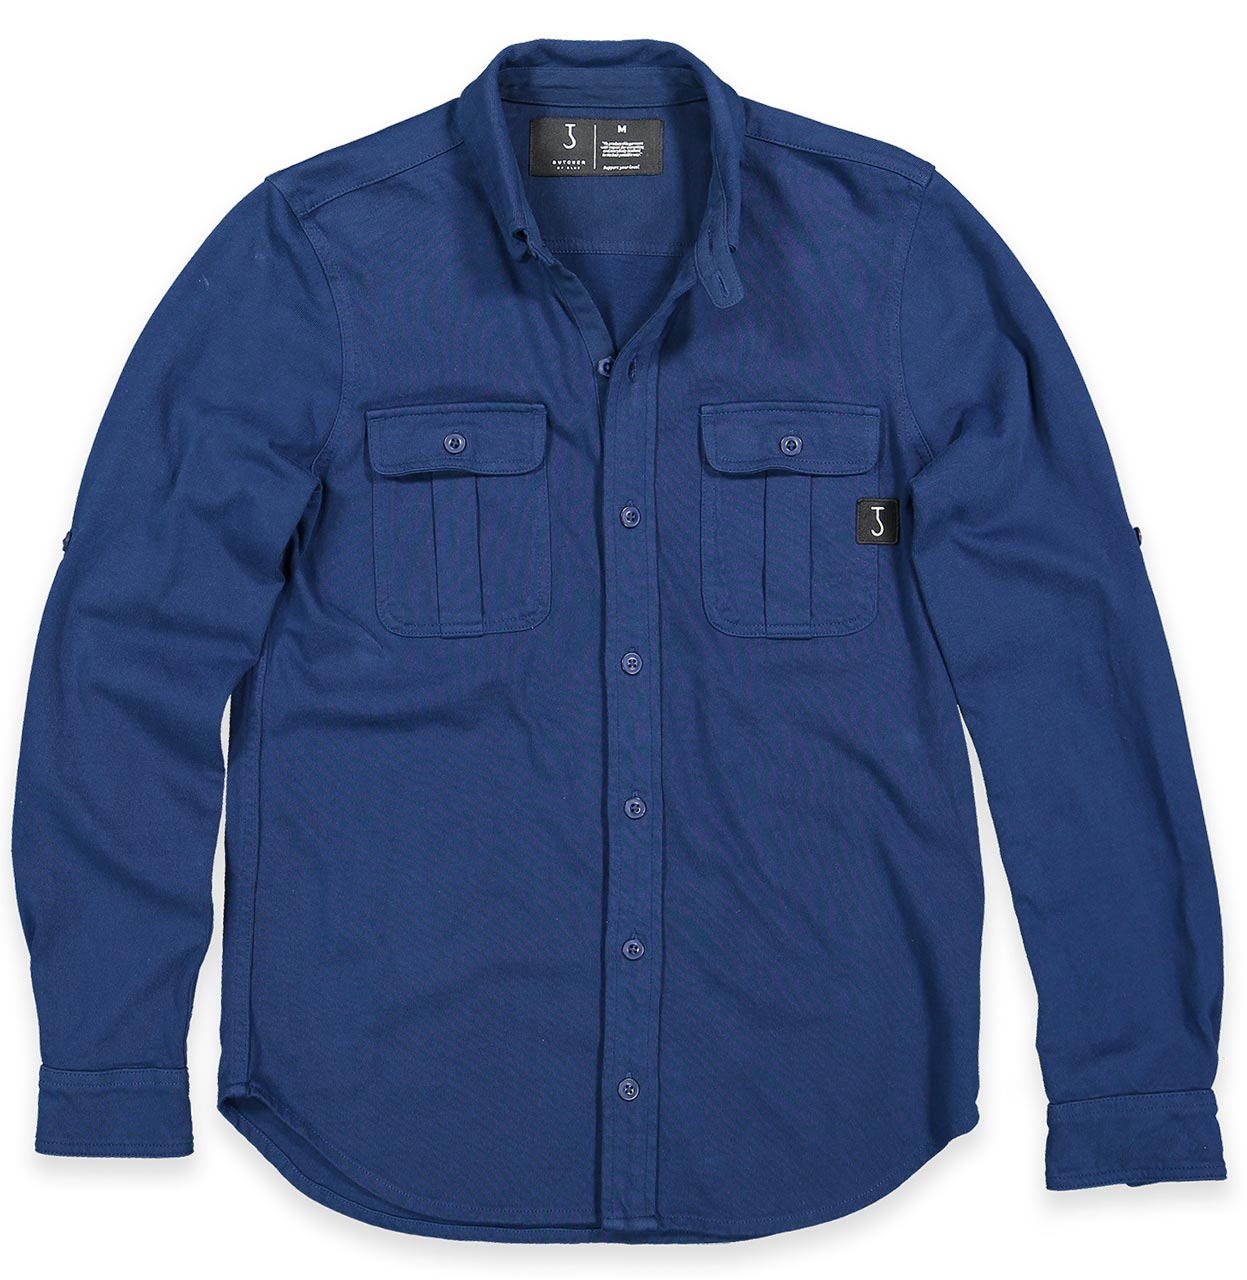 Butcher of Blue Shirt 1814000 870 1814000 blauw Maat L